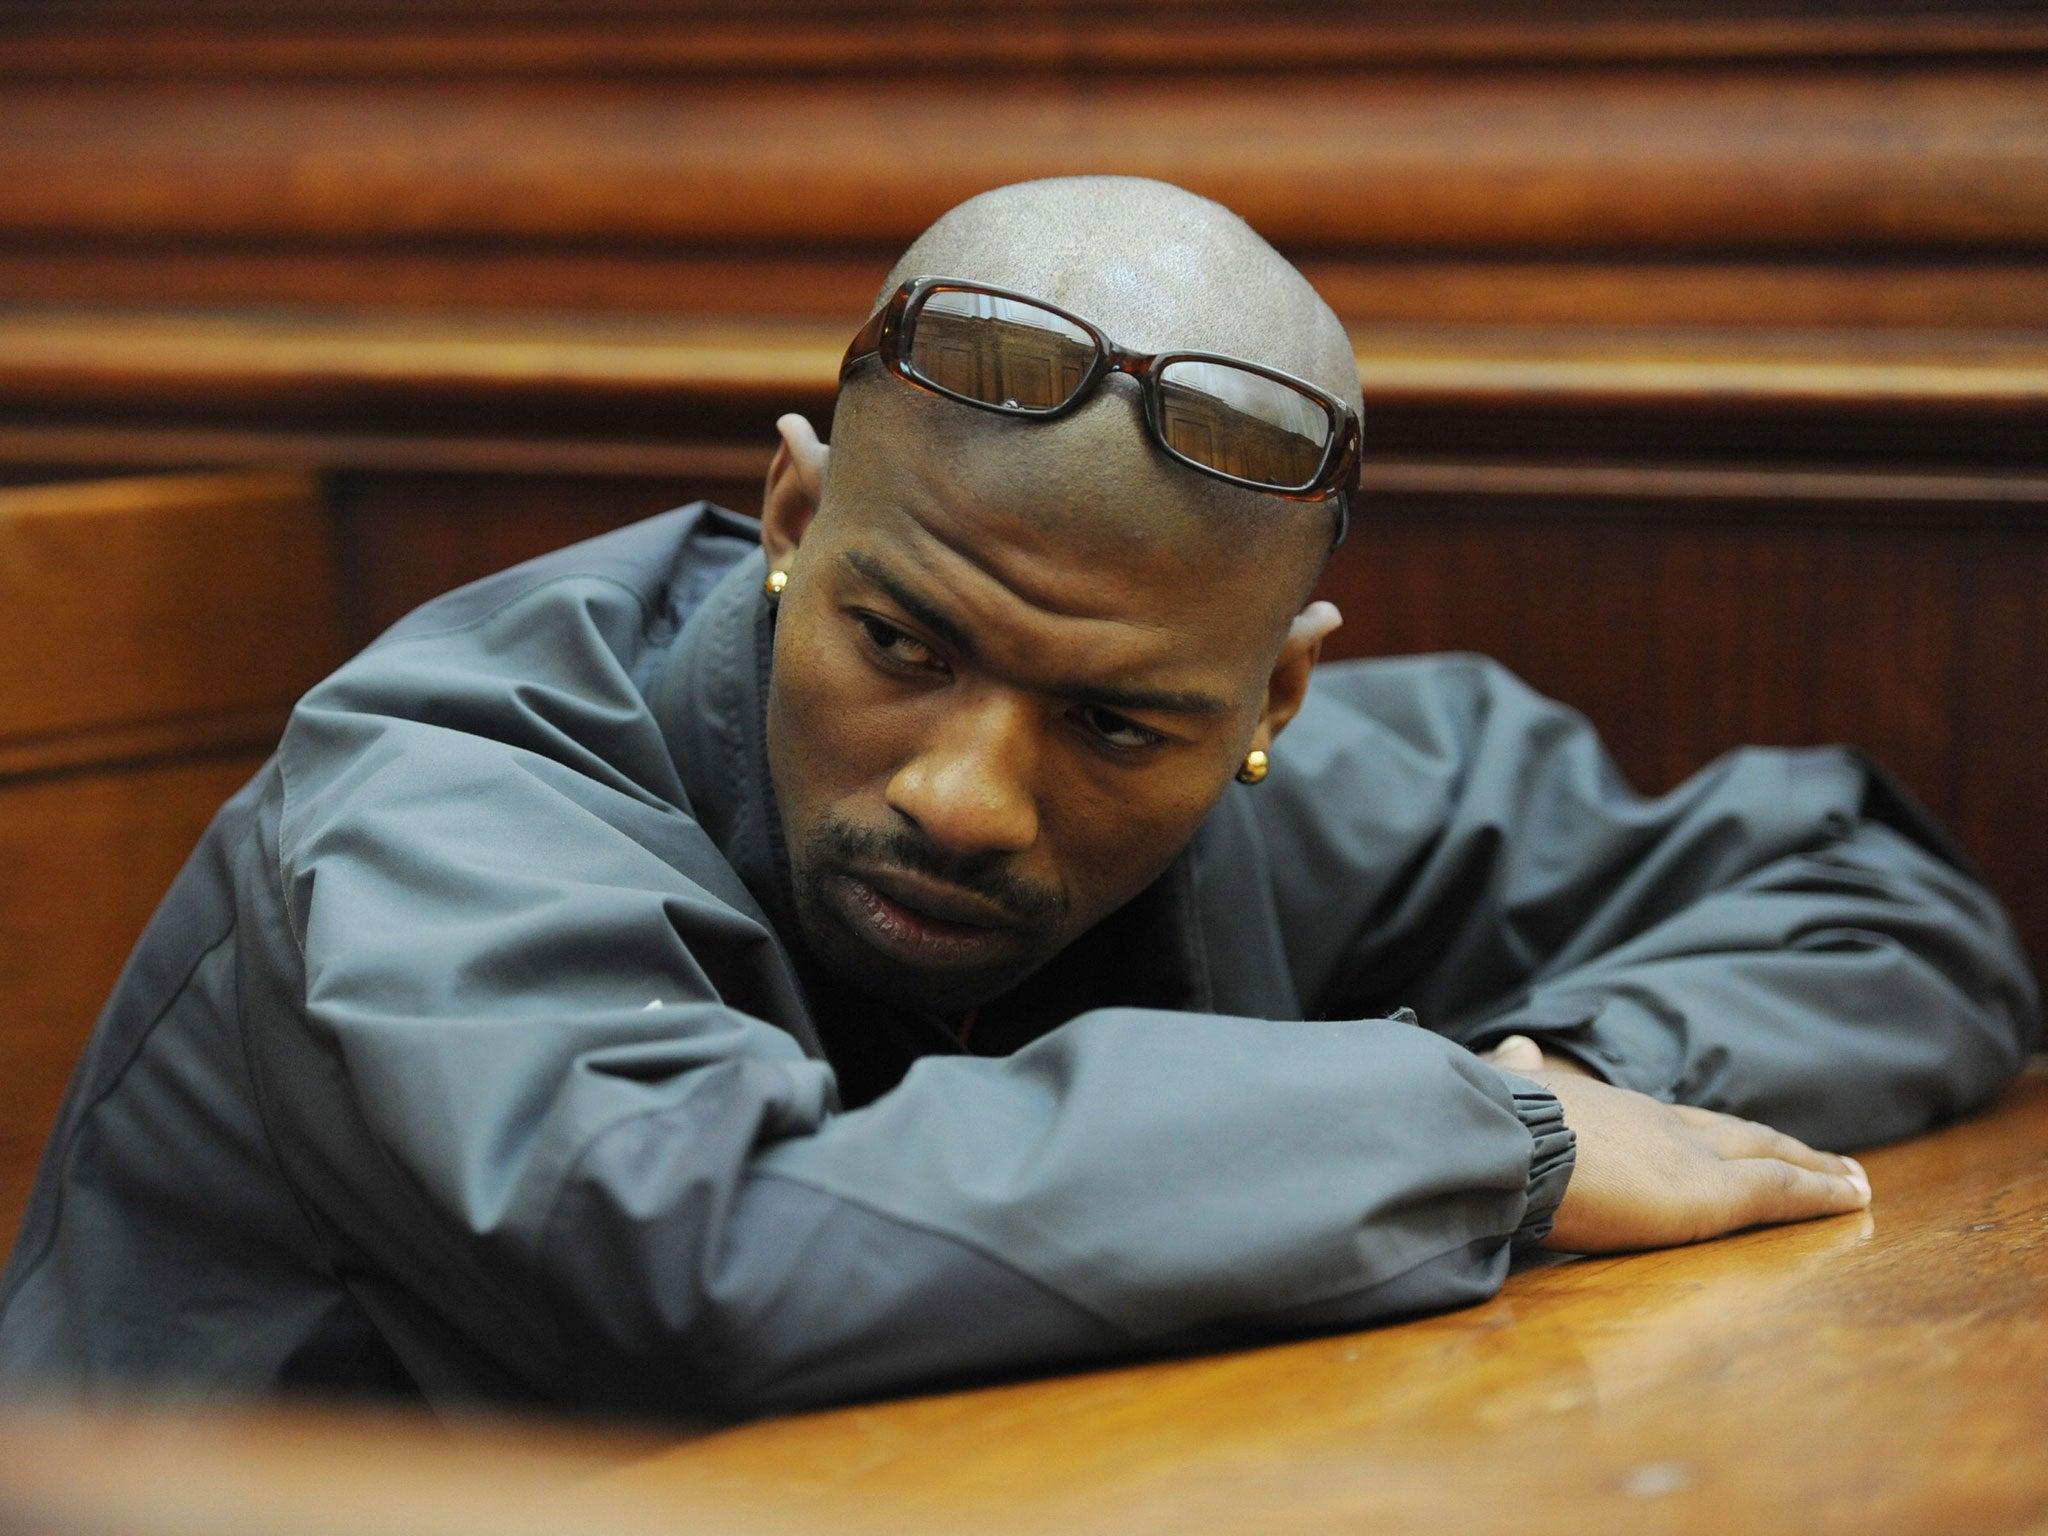 Dewani killer dead in prison: Hit man Xolile Mngeni dies of cancer